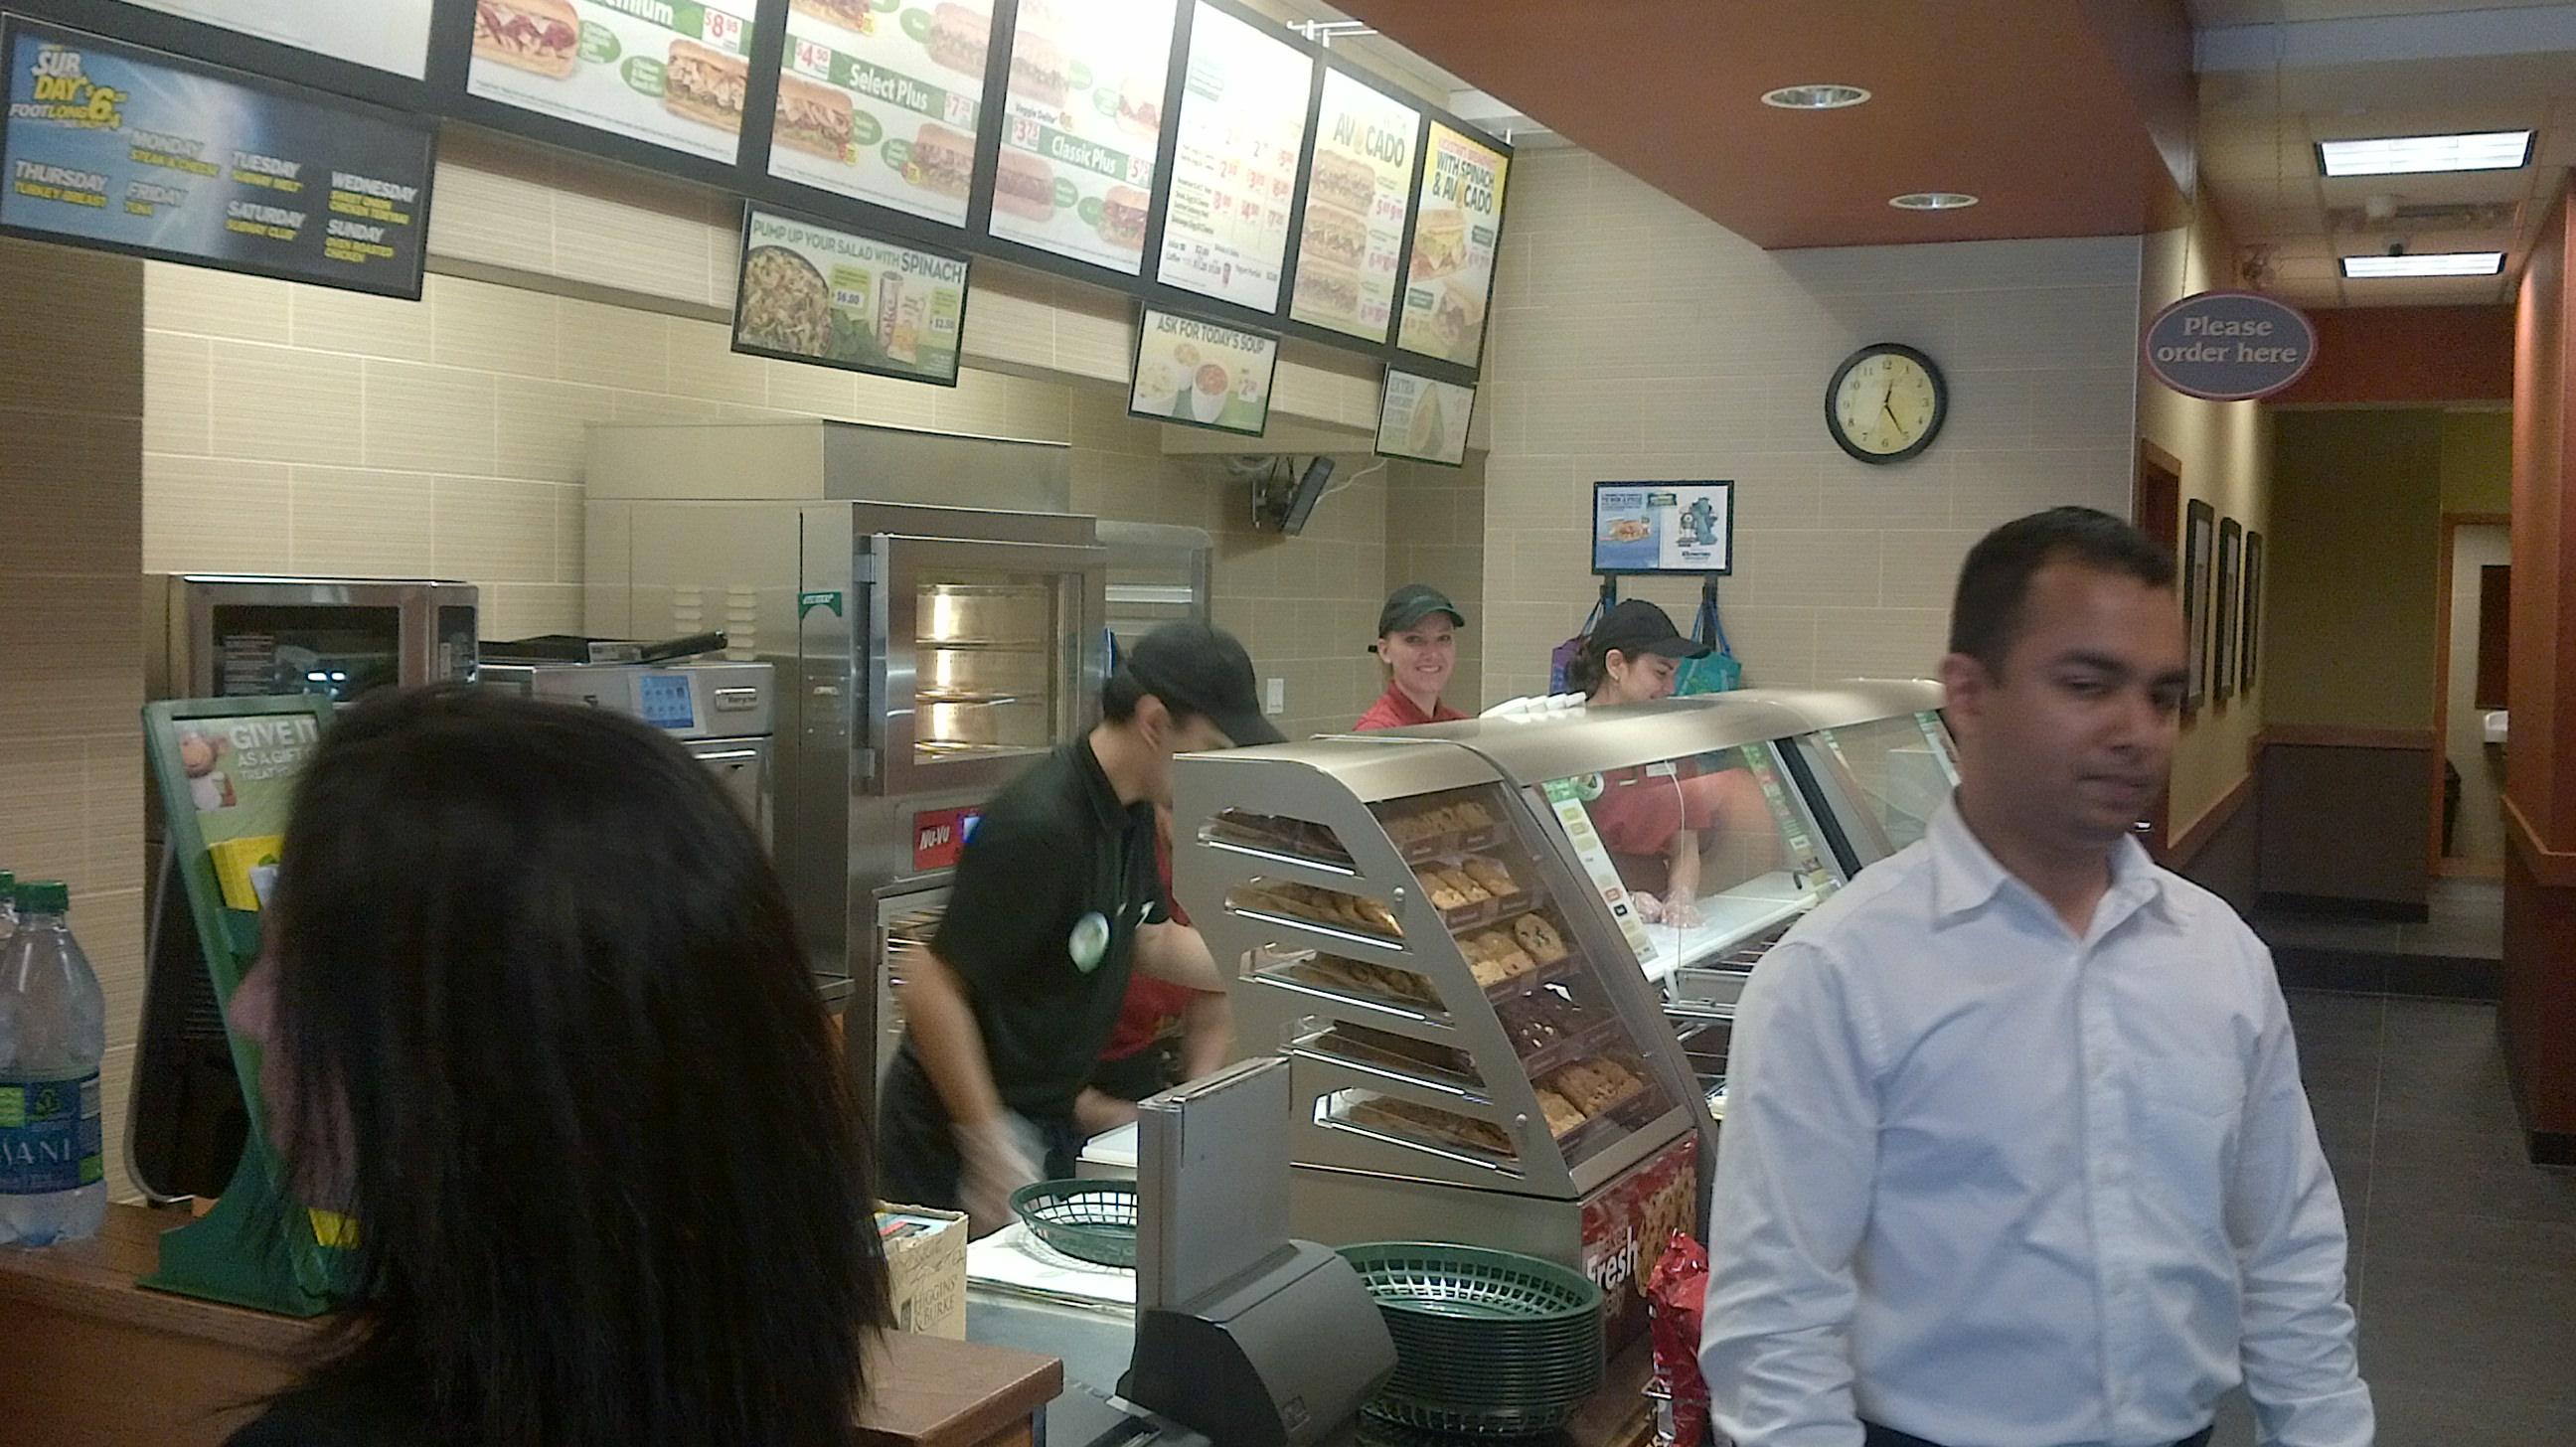 Getting to know the man behind subway subwayontario